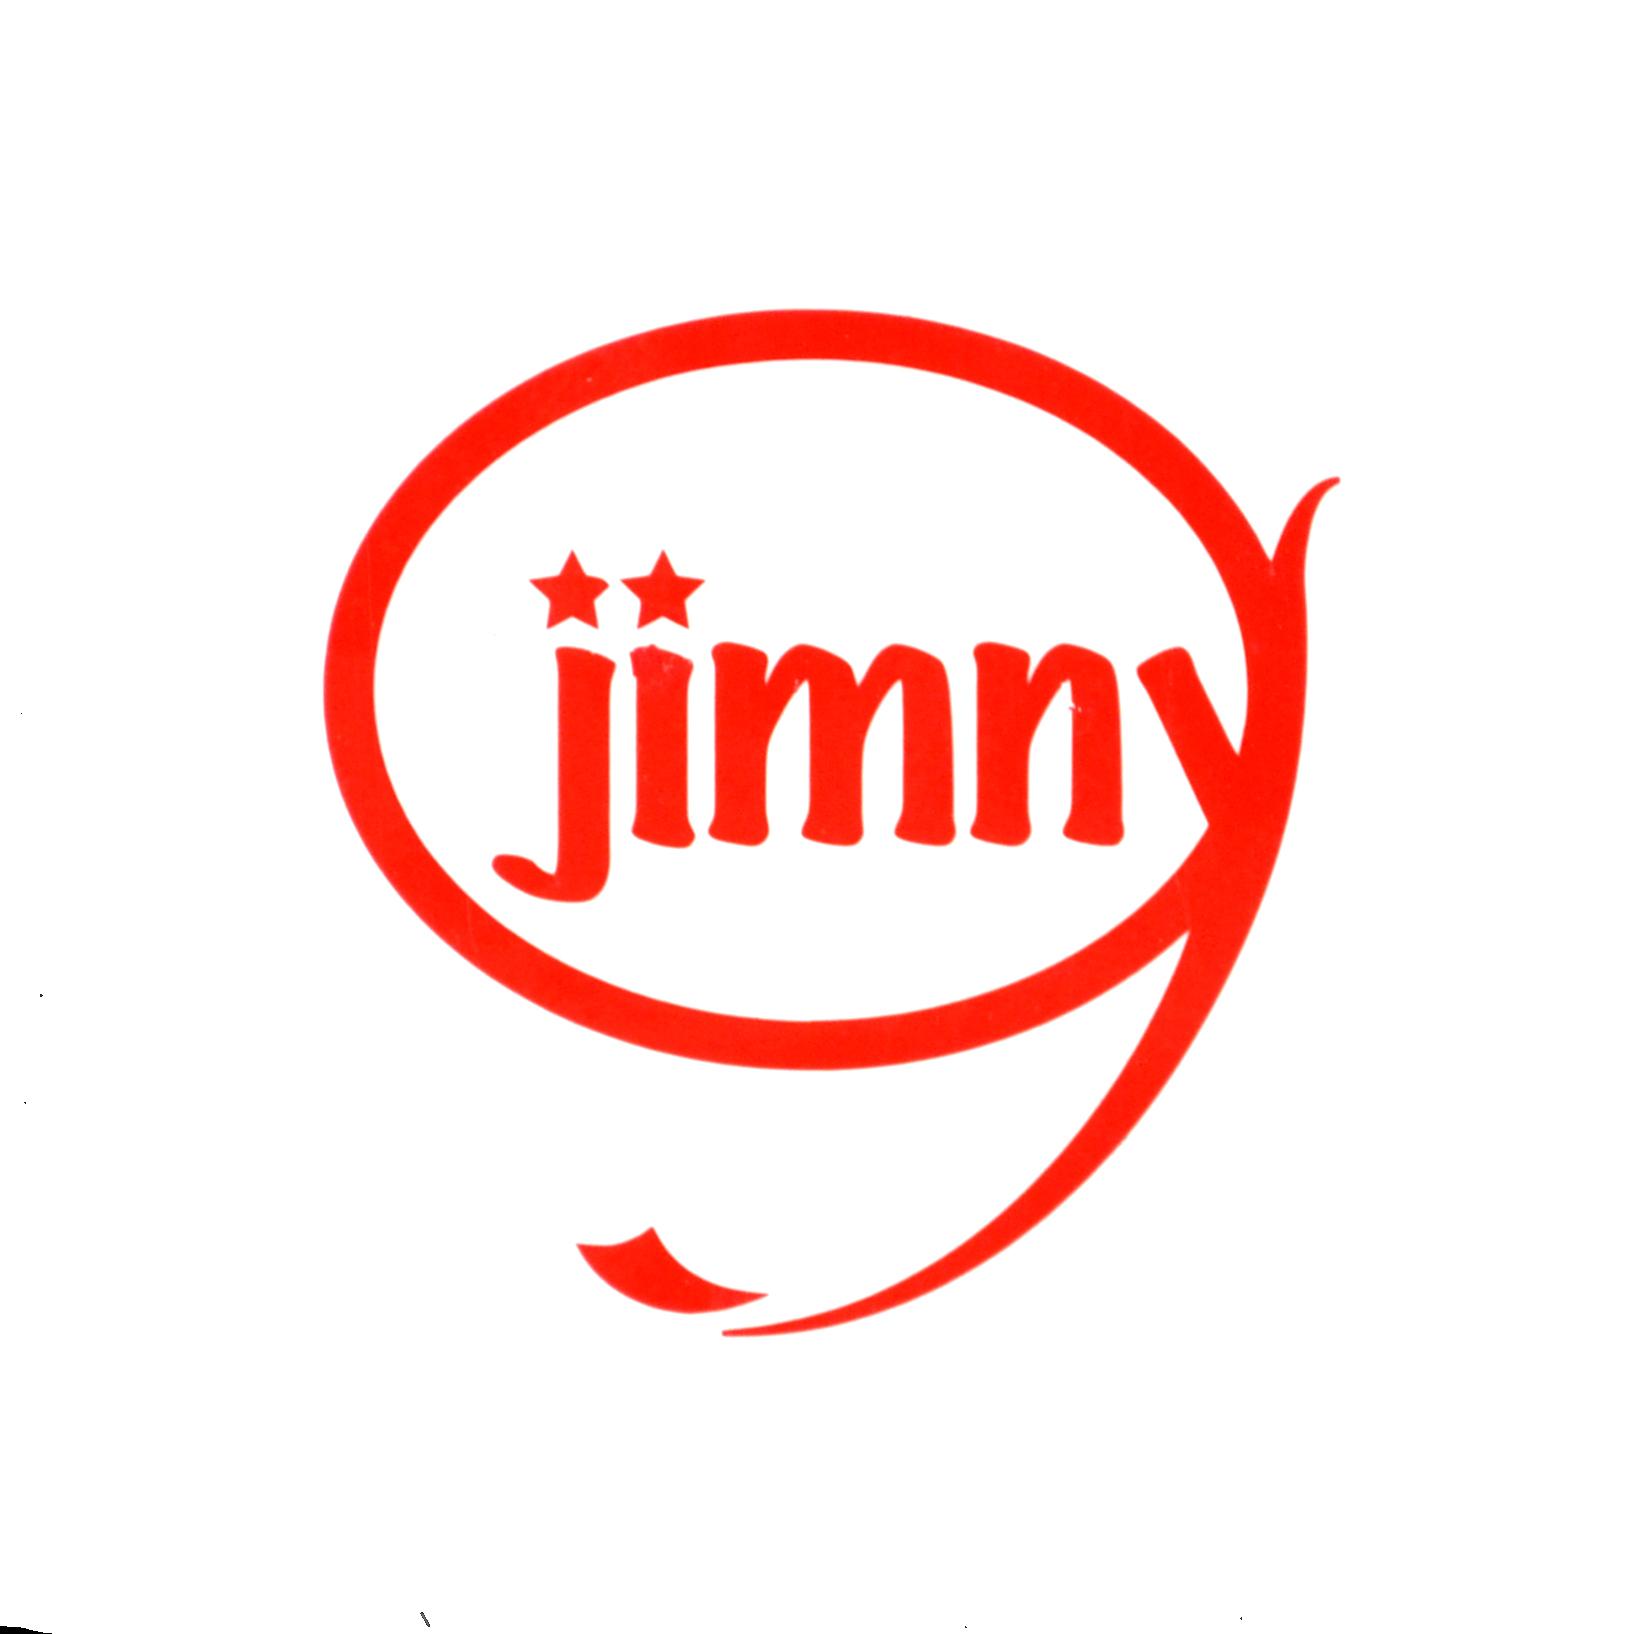 Jimny ステッカー(レッド)